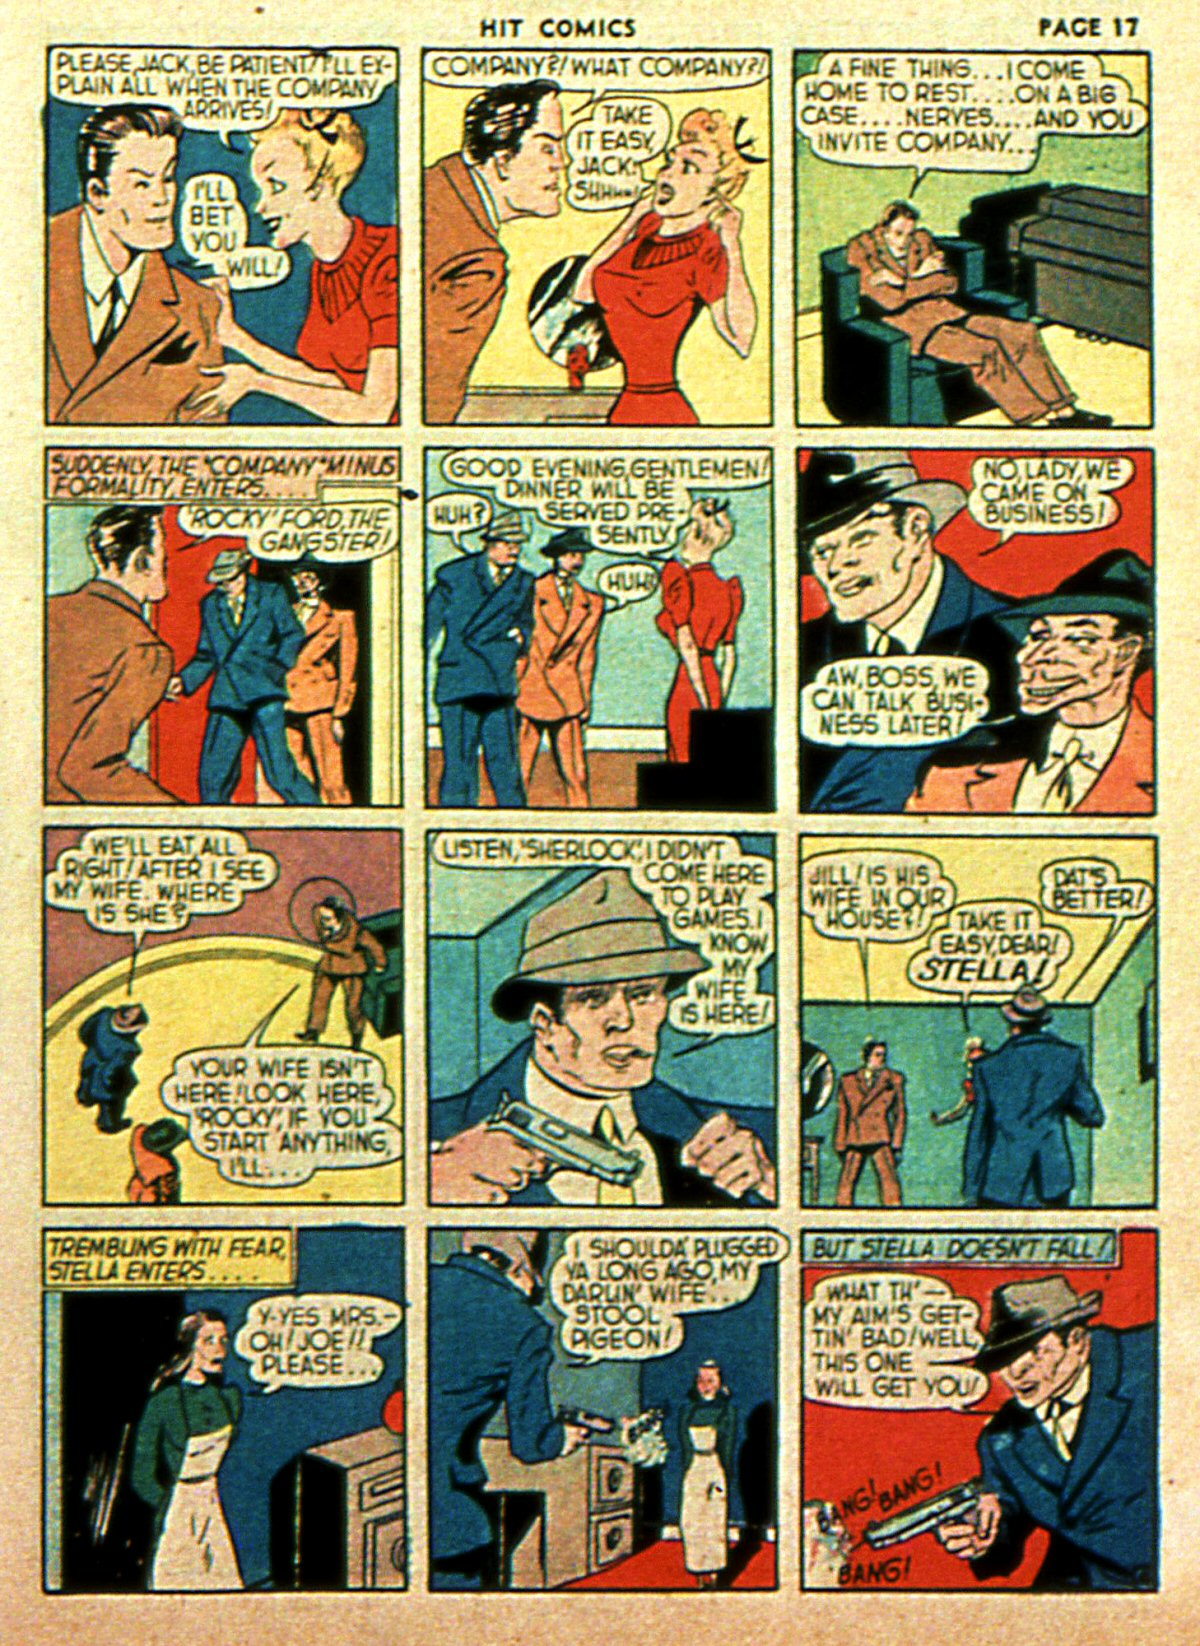 Read online Hit Comics comic -  Issue #2 - 19